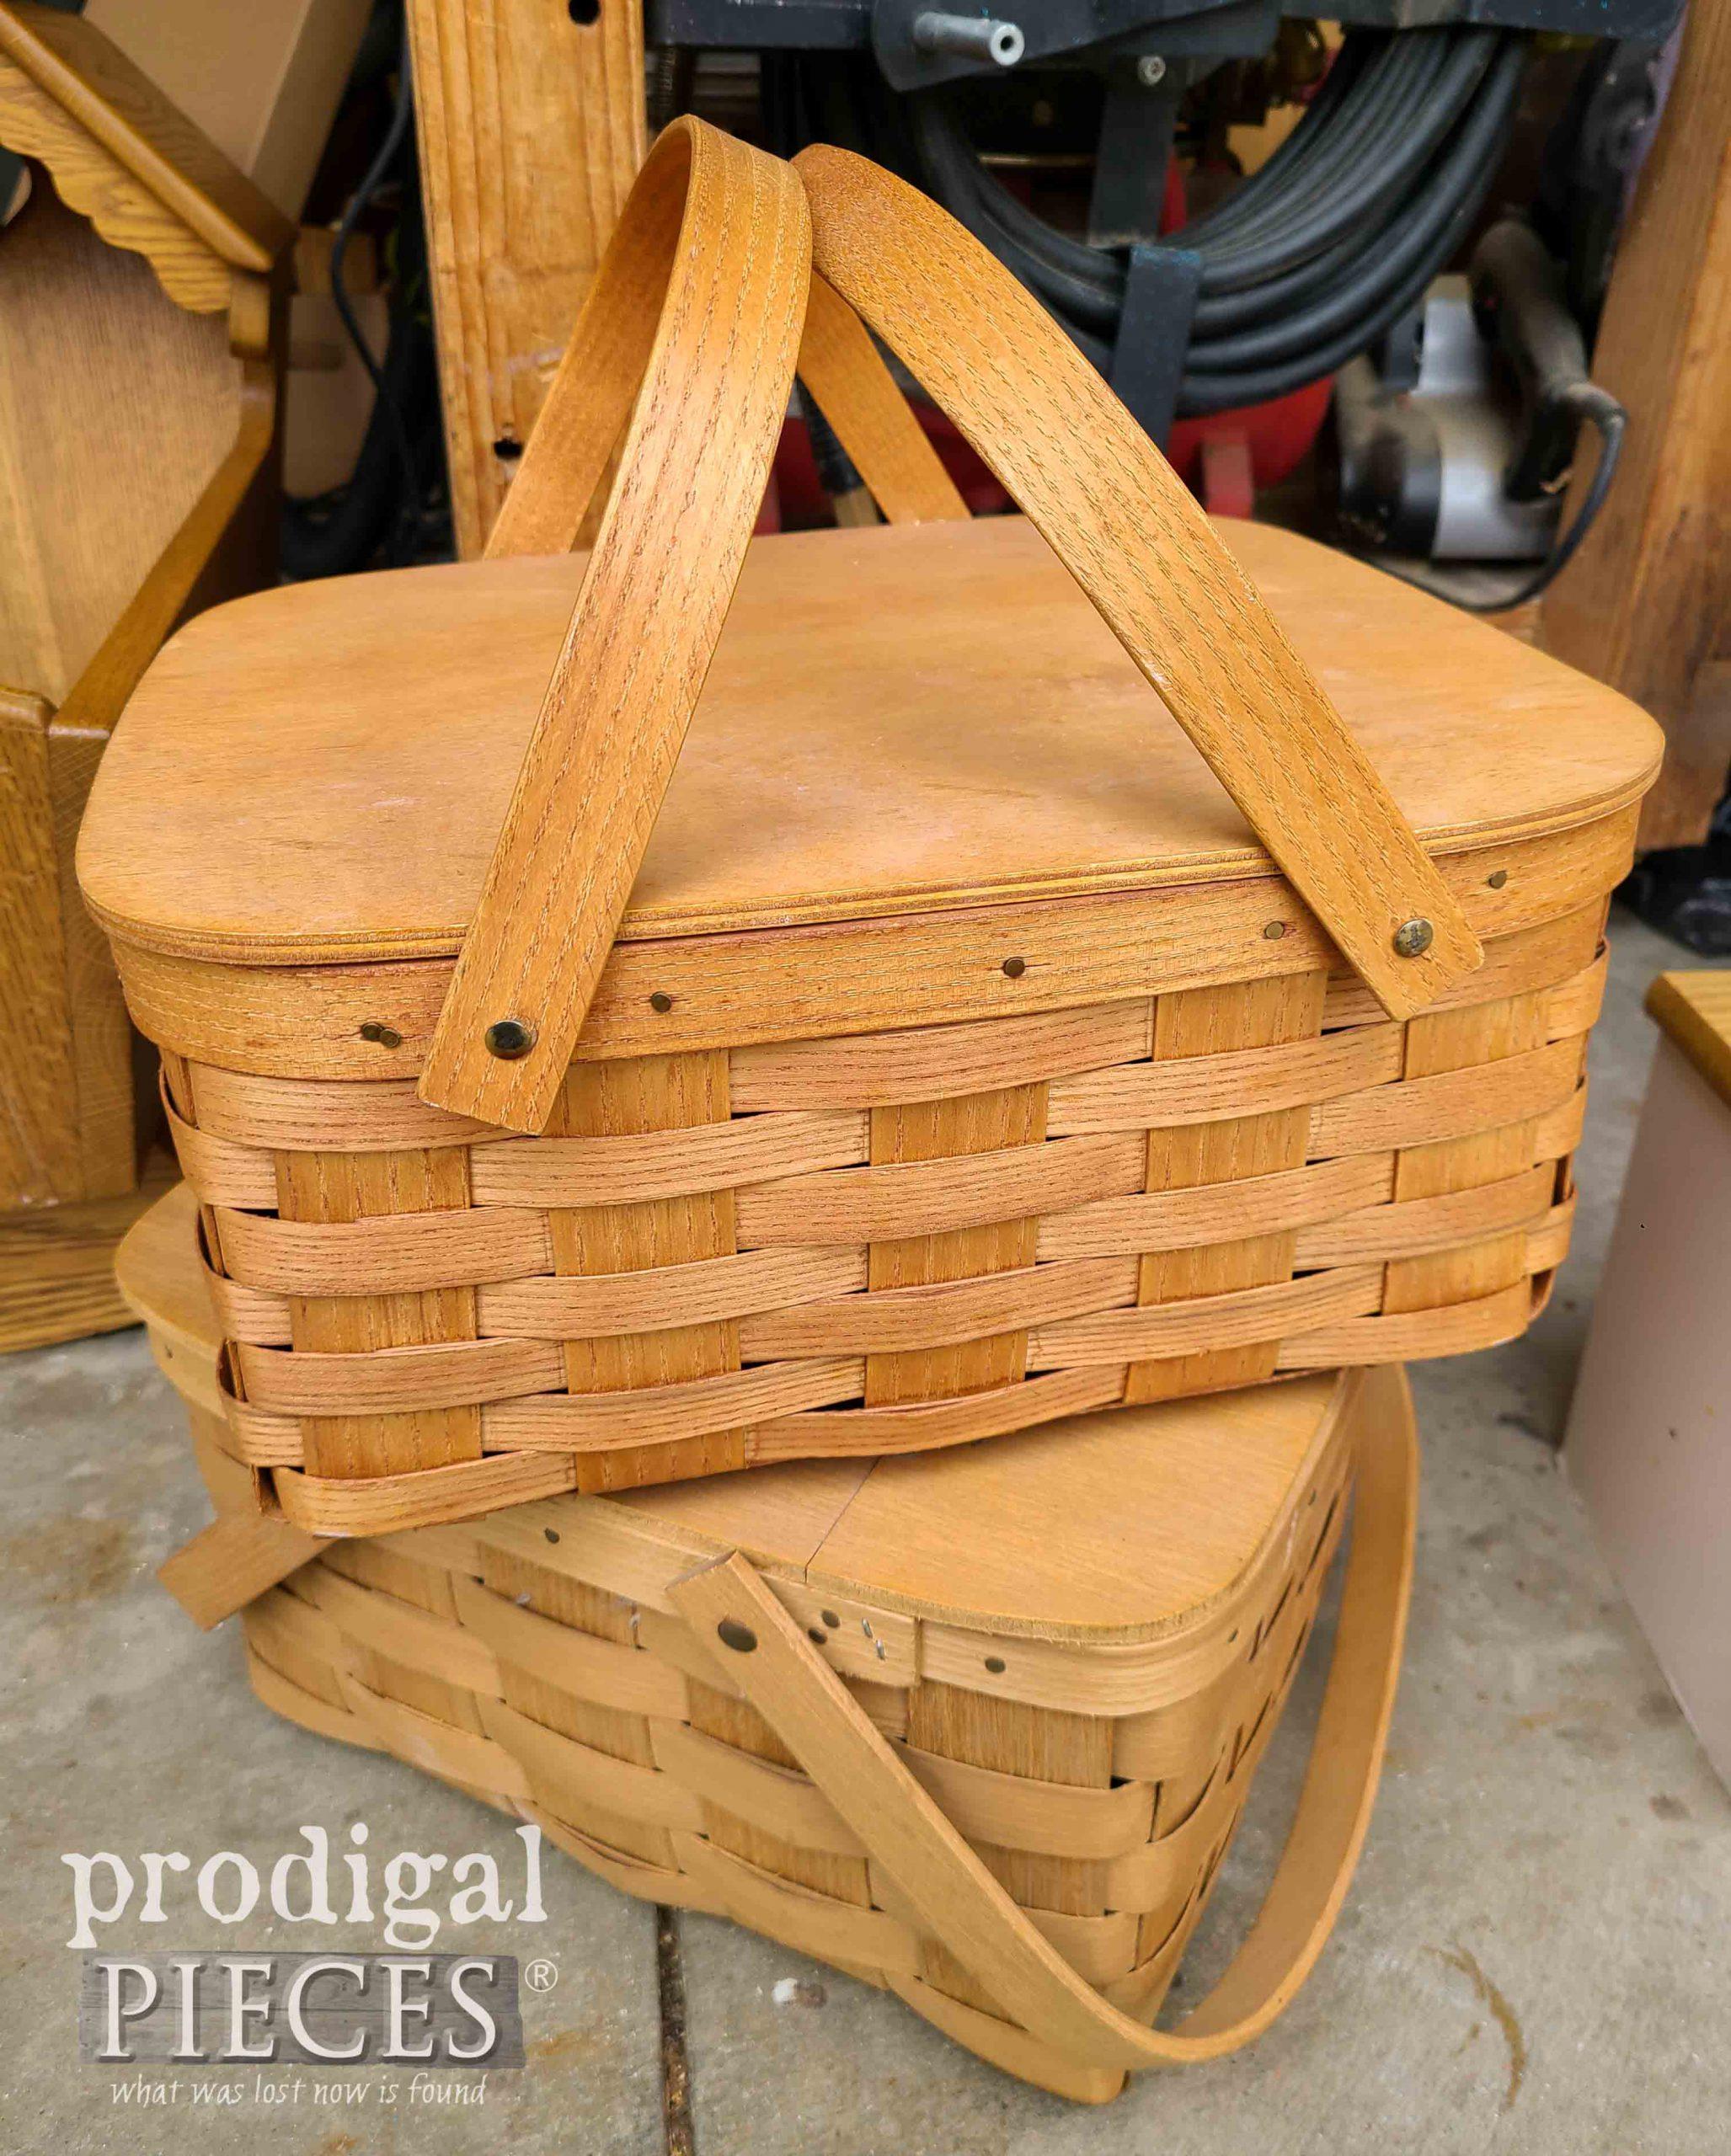 Thrifted Picnic Baskets Before | Prodigal Pieces | prodigalpieces.com